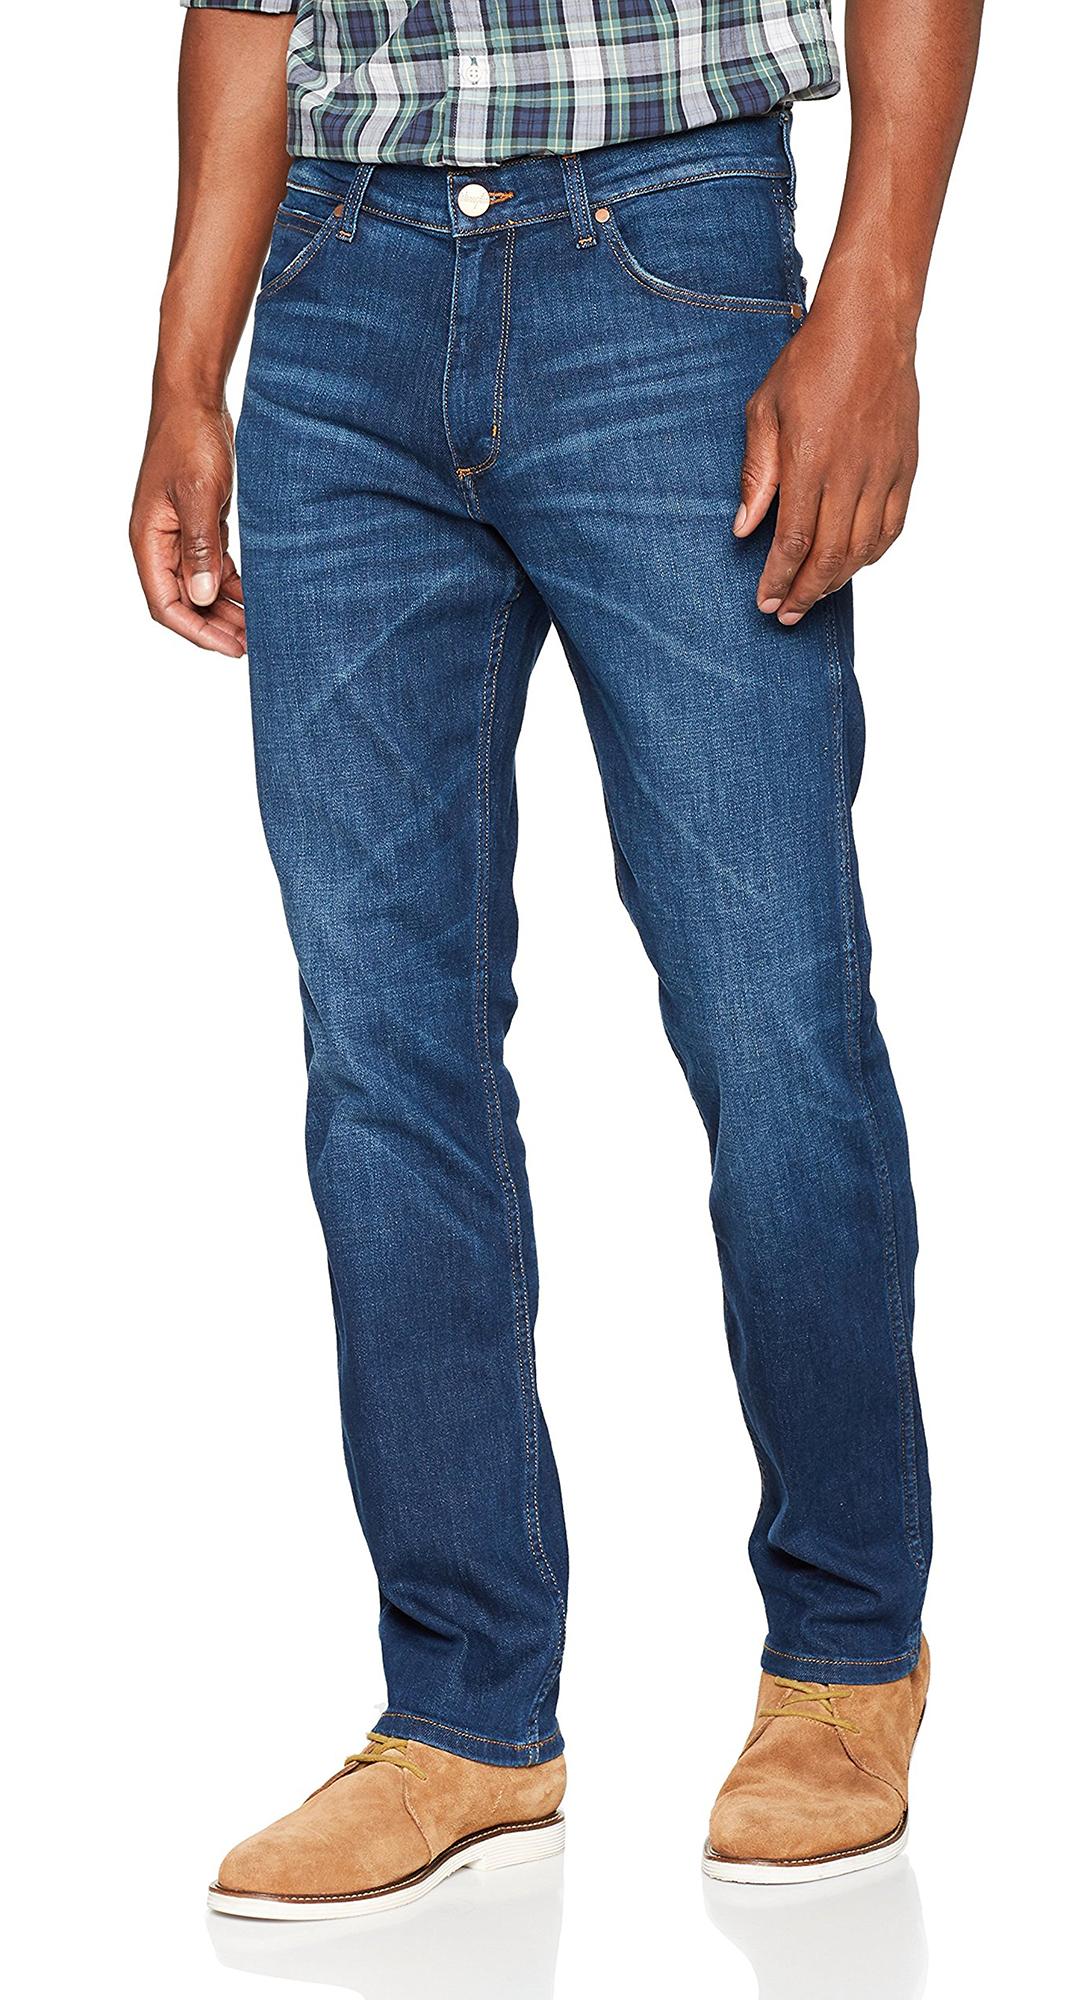 Wrangler Greensboro Regular Straight Tapered Stretch Jeans Blown Away Denim